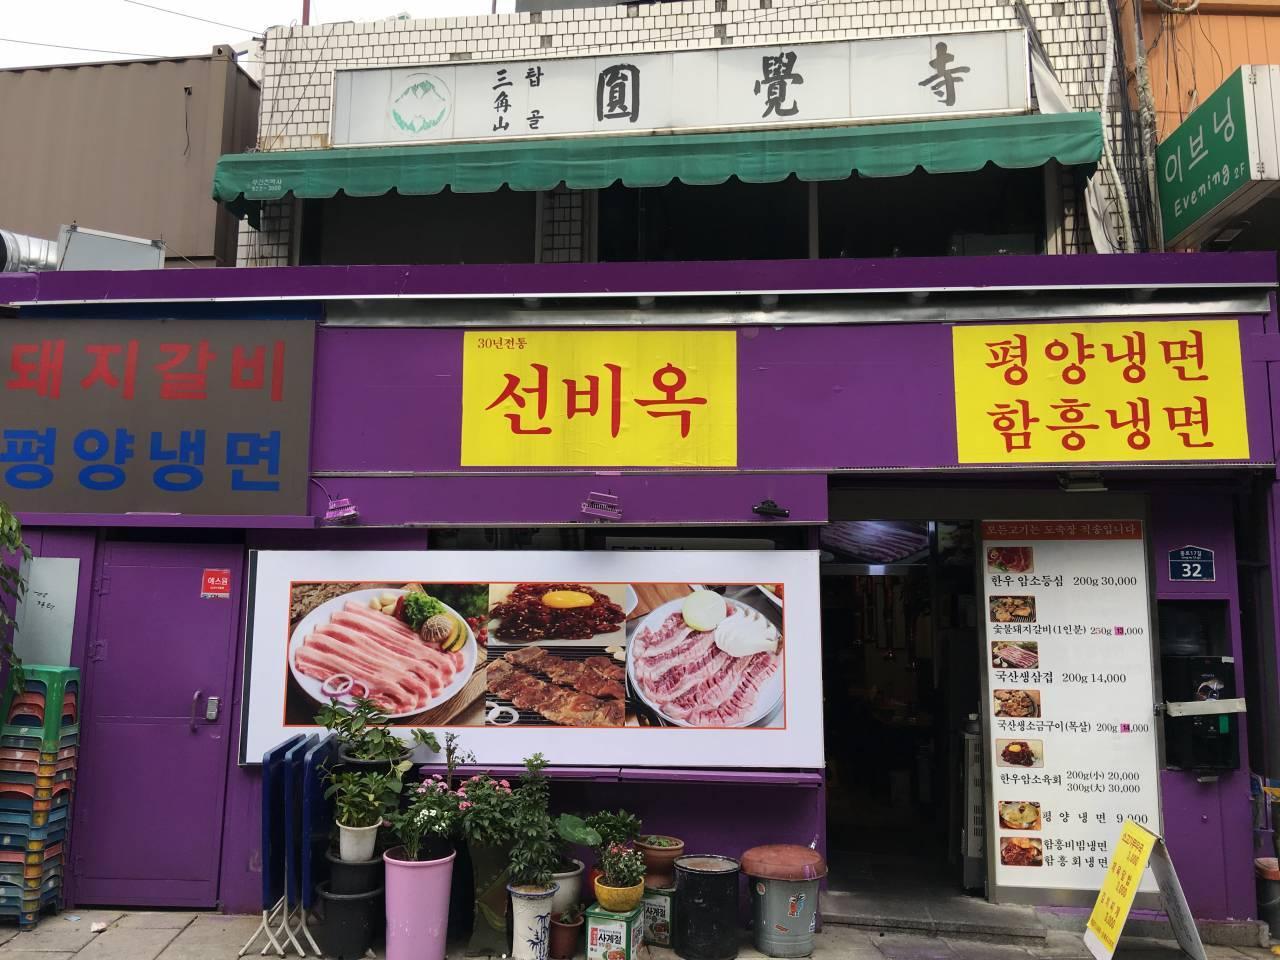 Seonbiok(선비옥)